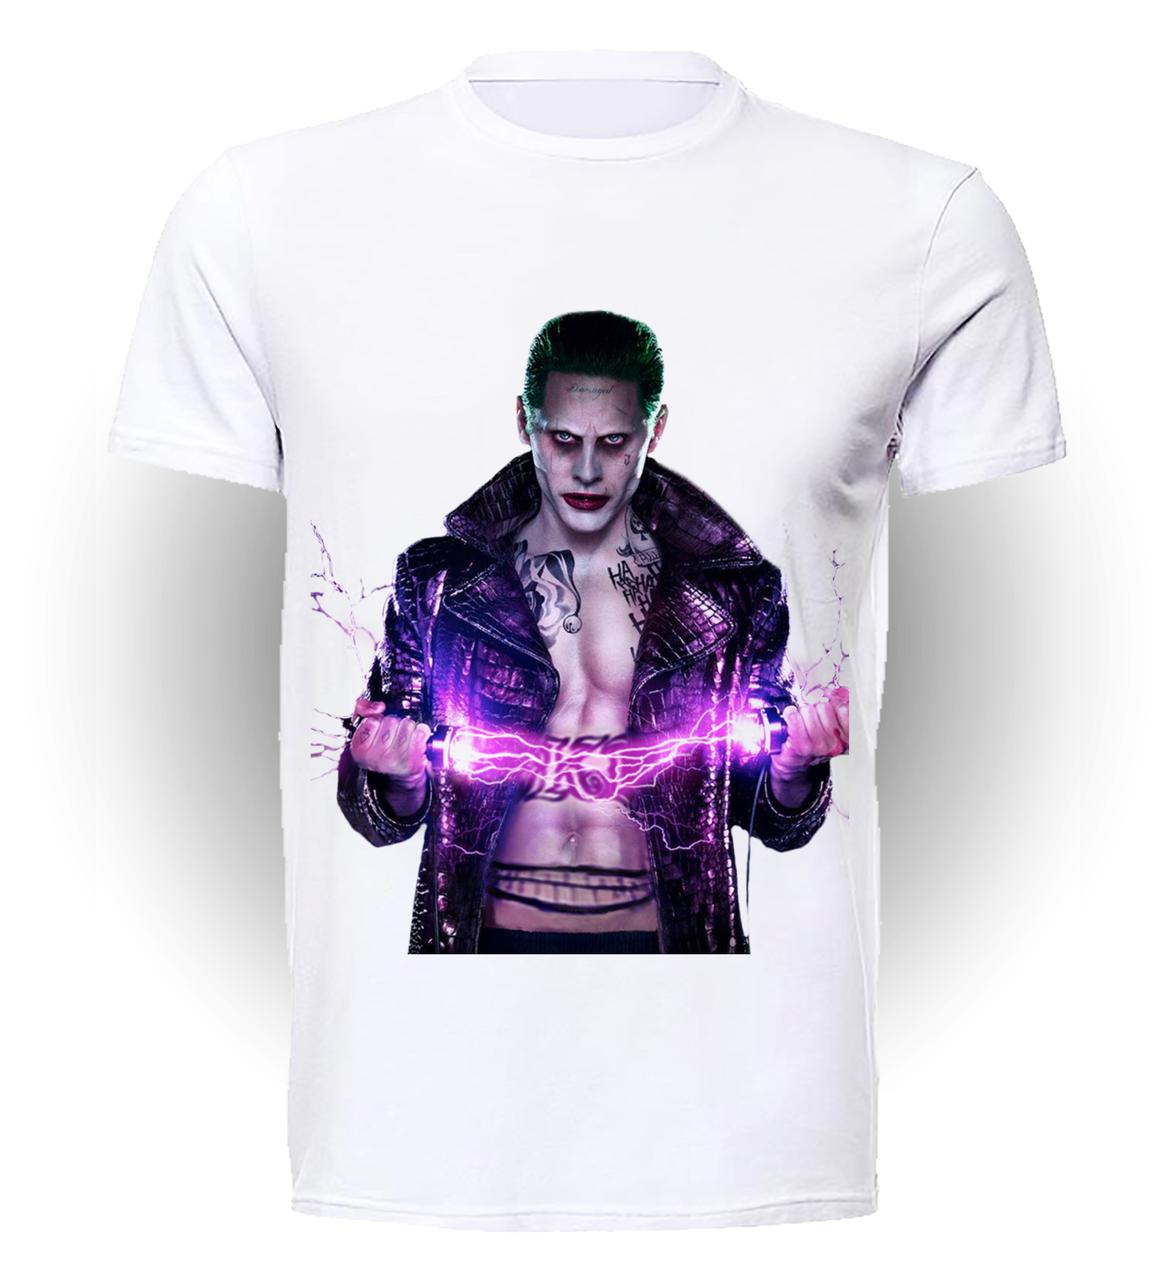 Футболка мужская GeekLand Отряд Самоубийц Suicide Squad Leto Joker SS.01.052